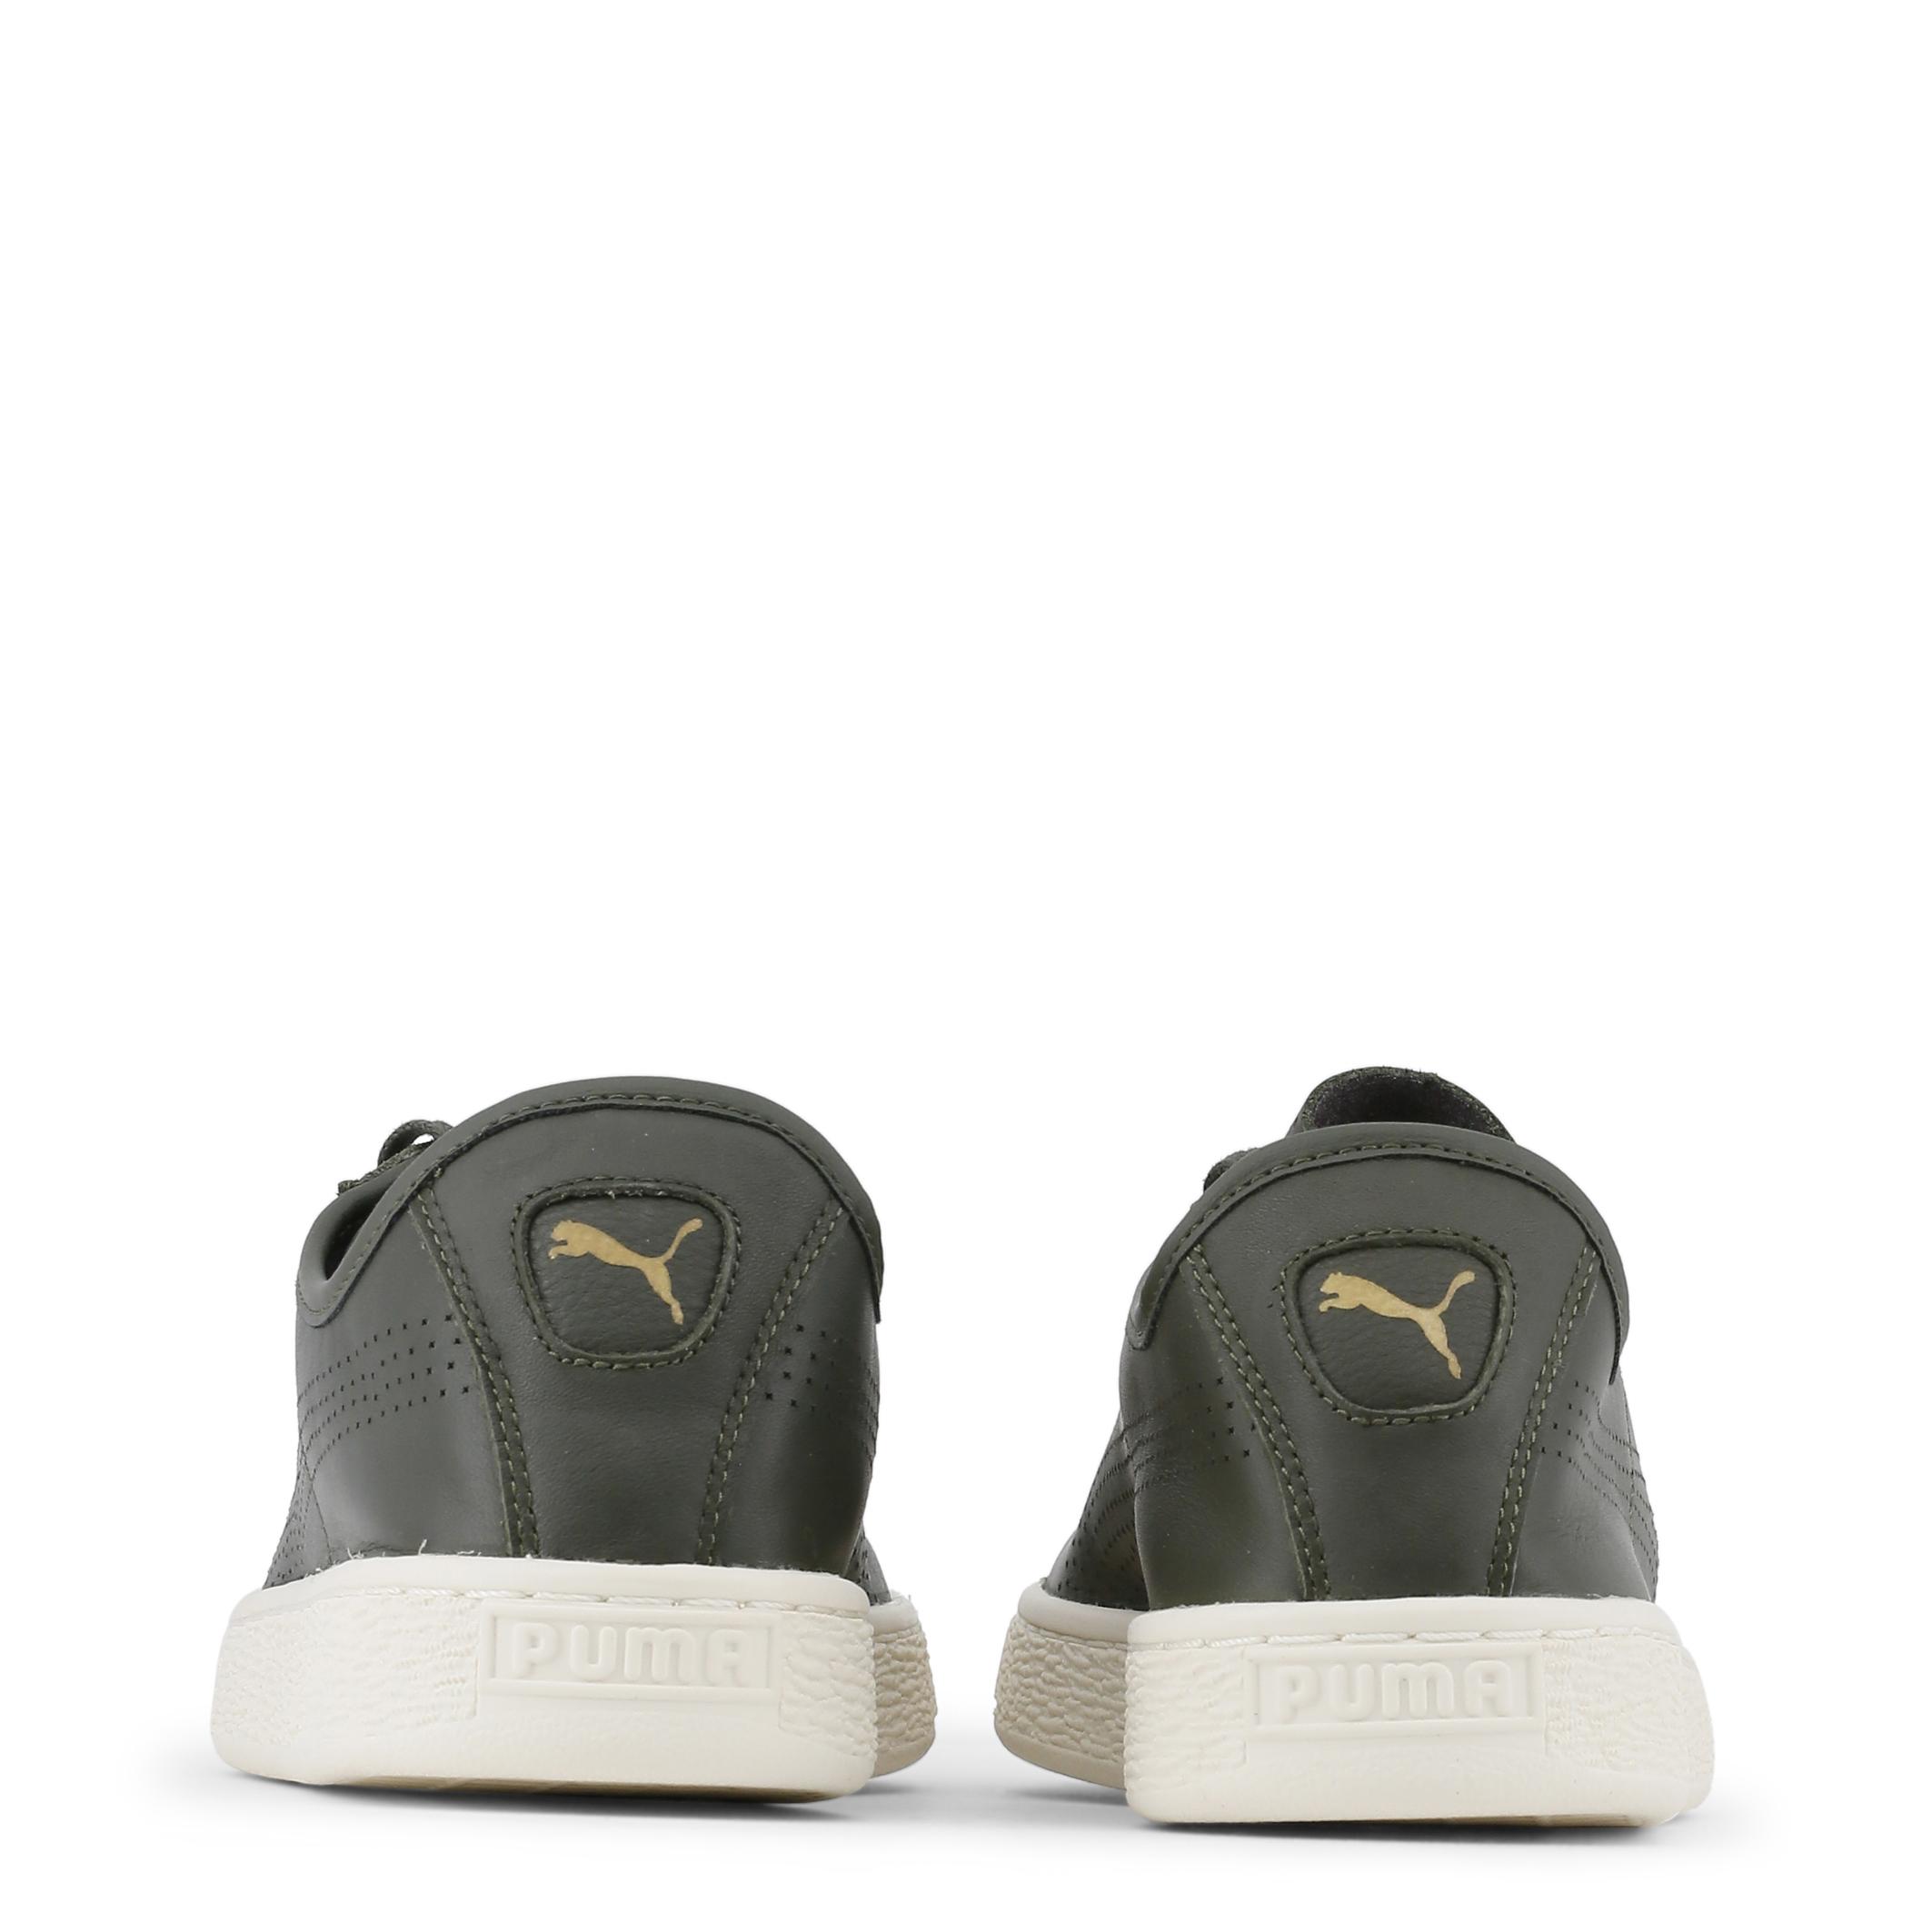 Baskets / Sport  Puma 363824 green